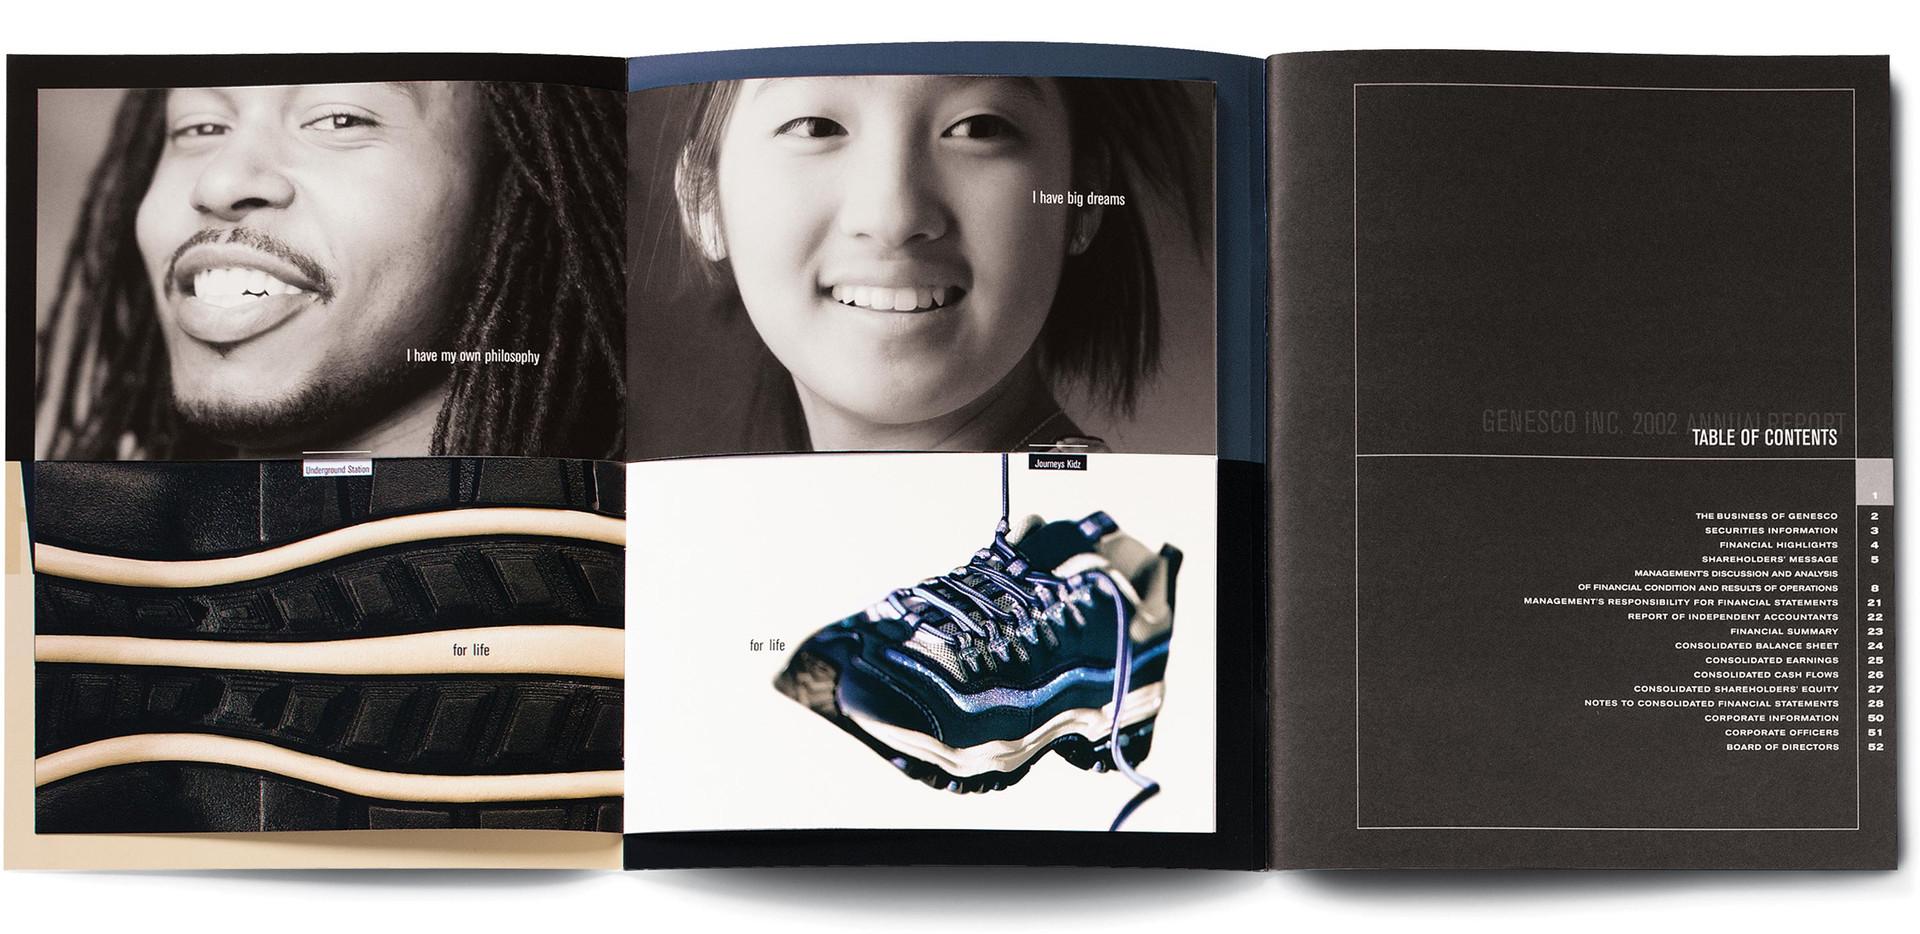 genesco-annual-report-3.jpg